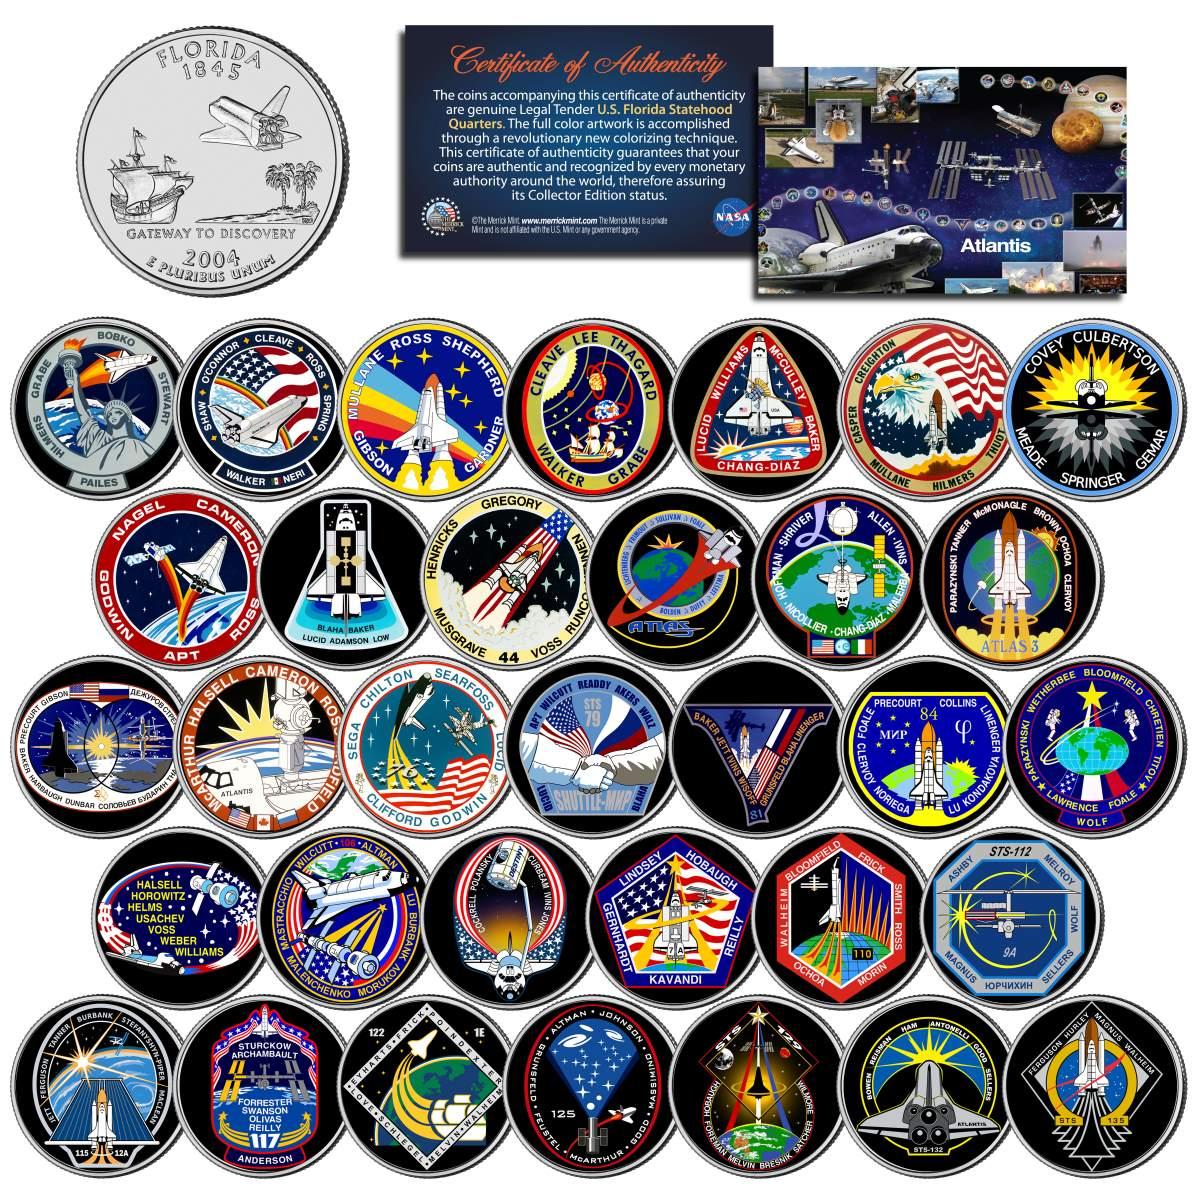 33-Coin Set NASA SPACE SHUTTLE ATLANTIS MISSIONS Colorized Florida Quarters U.S